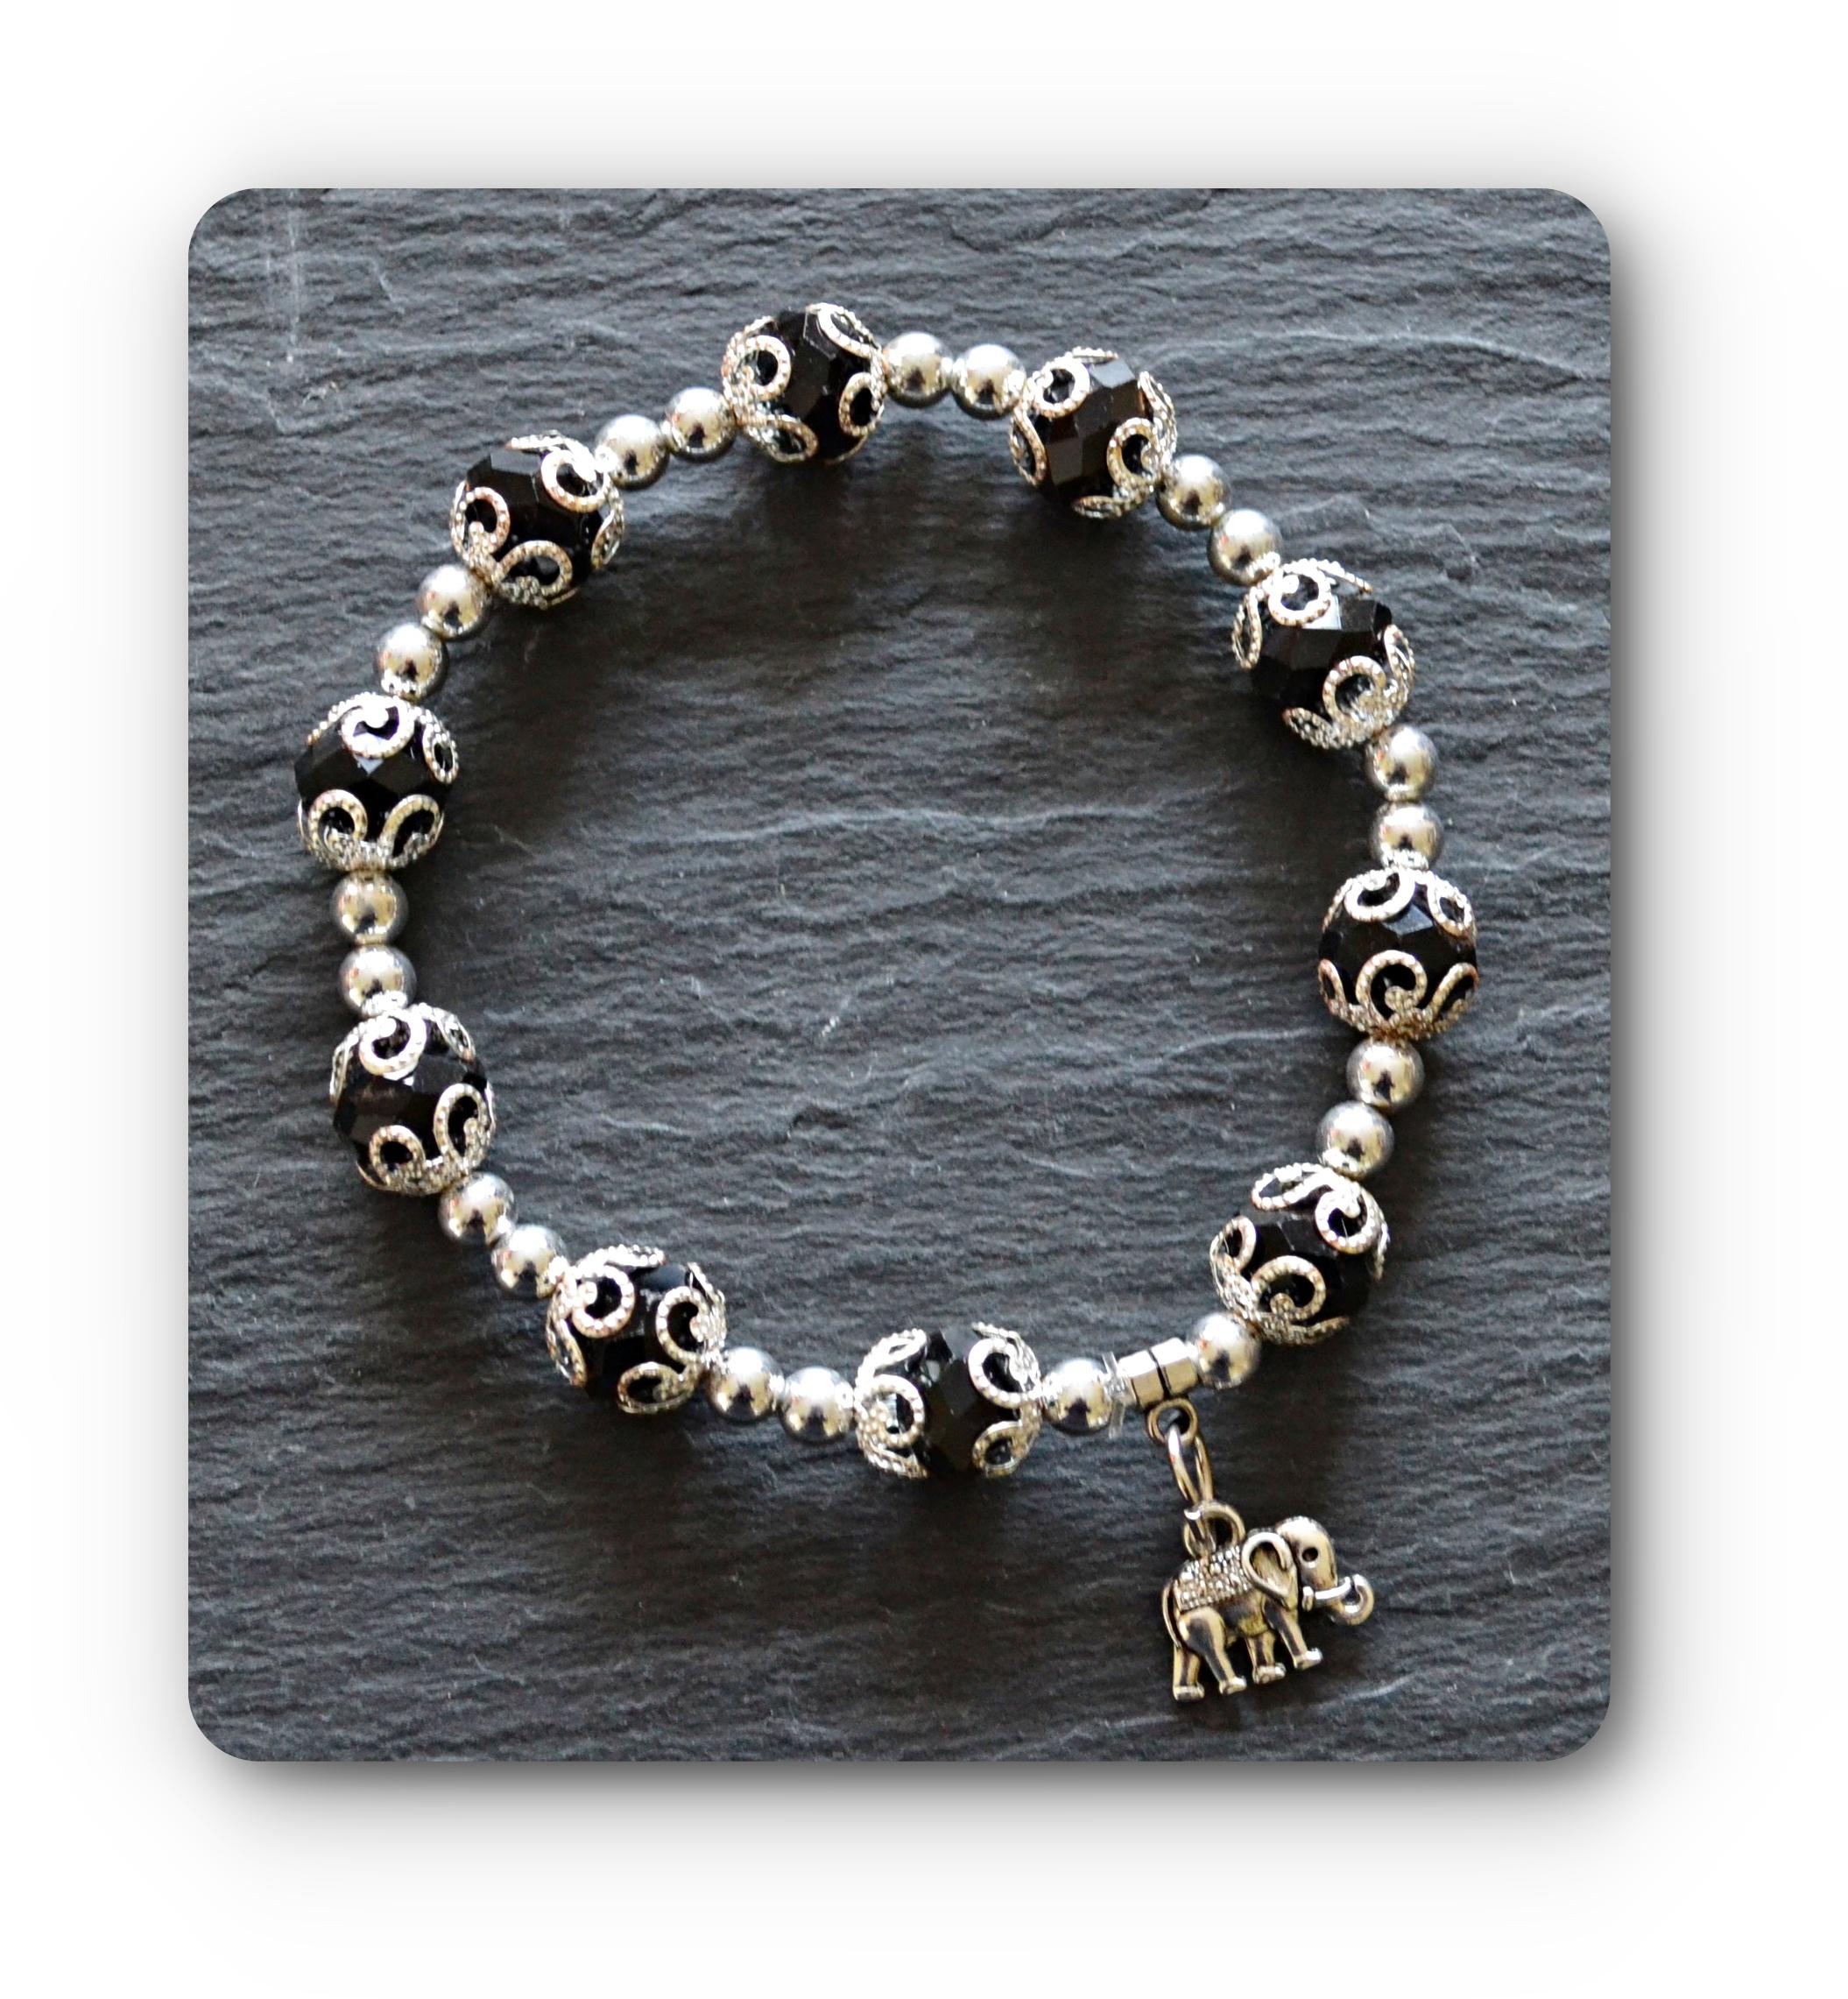 Black Amp Silver Lucky Elephant Bracelet Mystic Wish